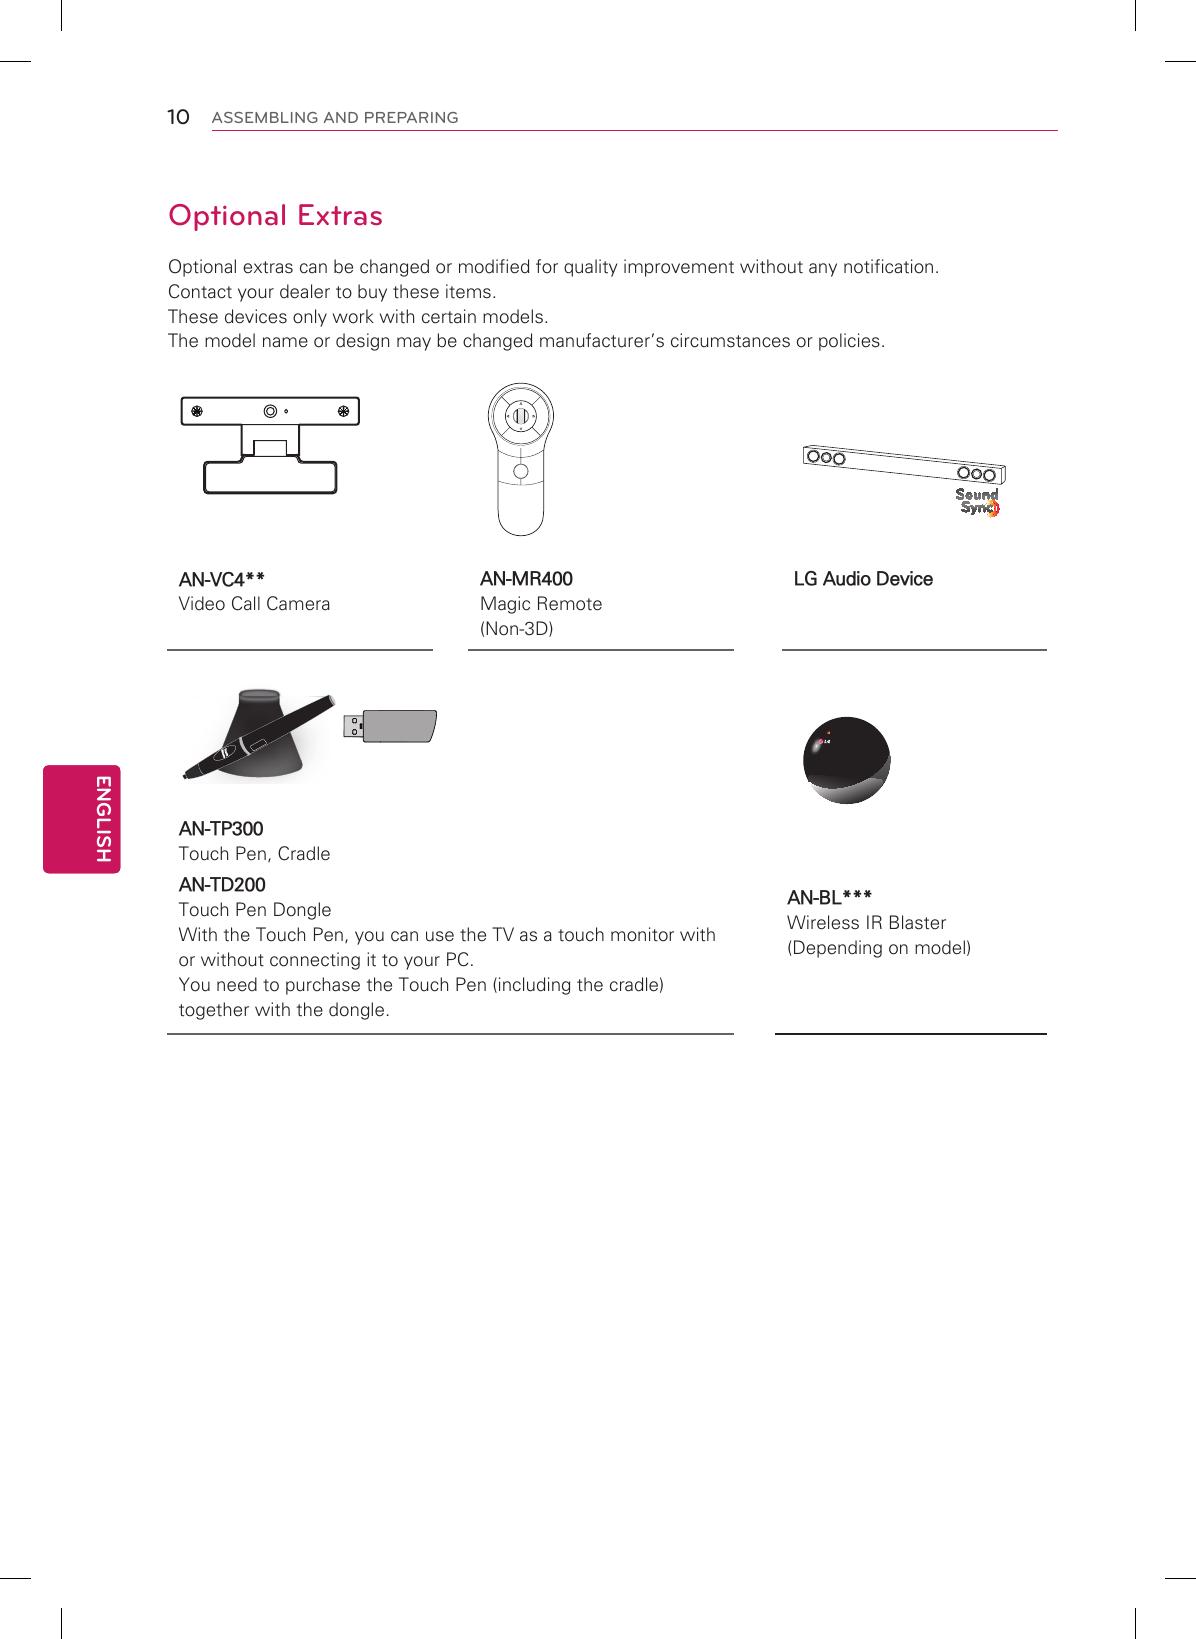 Lg 60Pn5700 Users Manual MFL67701717